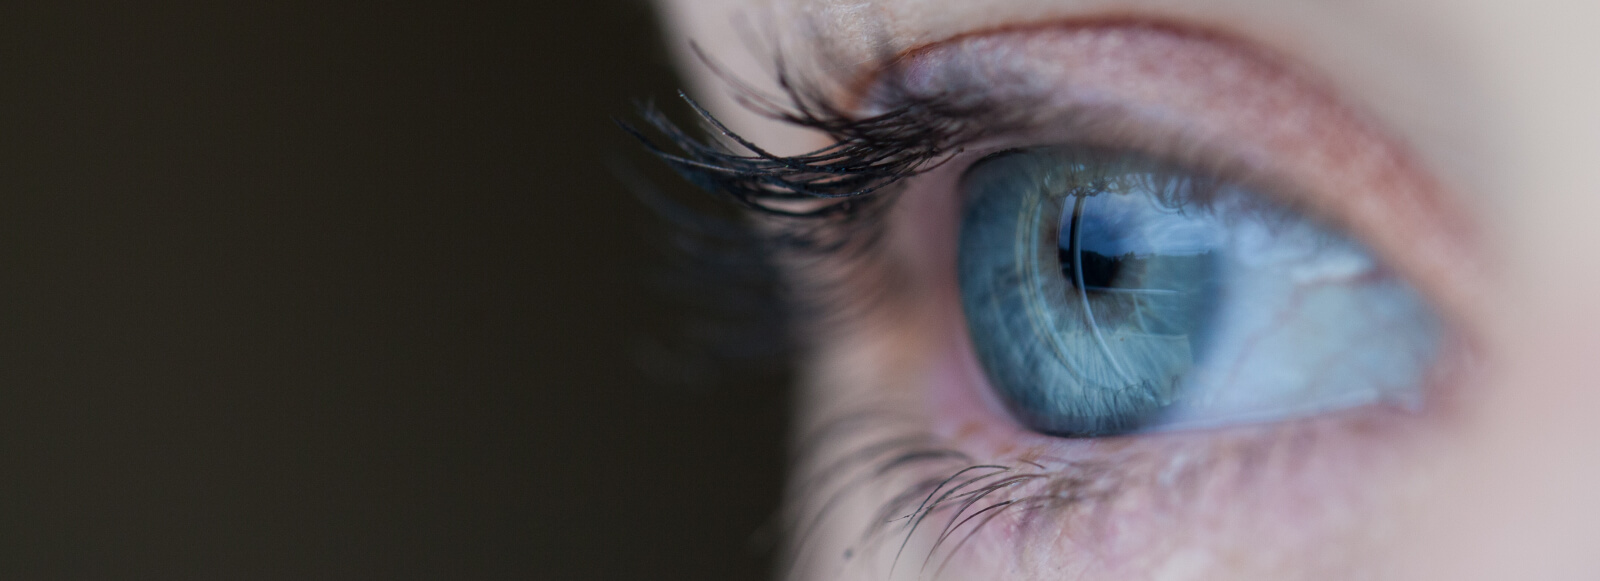 treatment-for-tired-eyes-abloomnova.net_-1600x581 Treatment for tired eyes